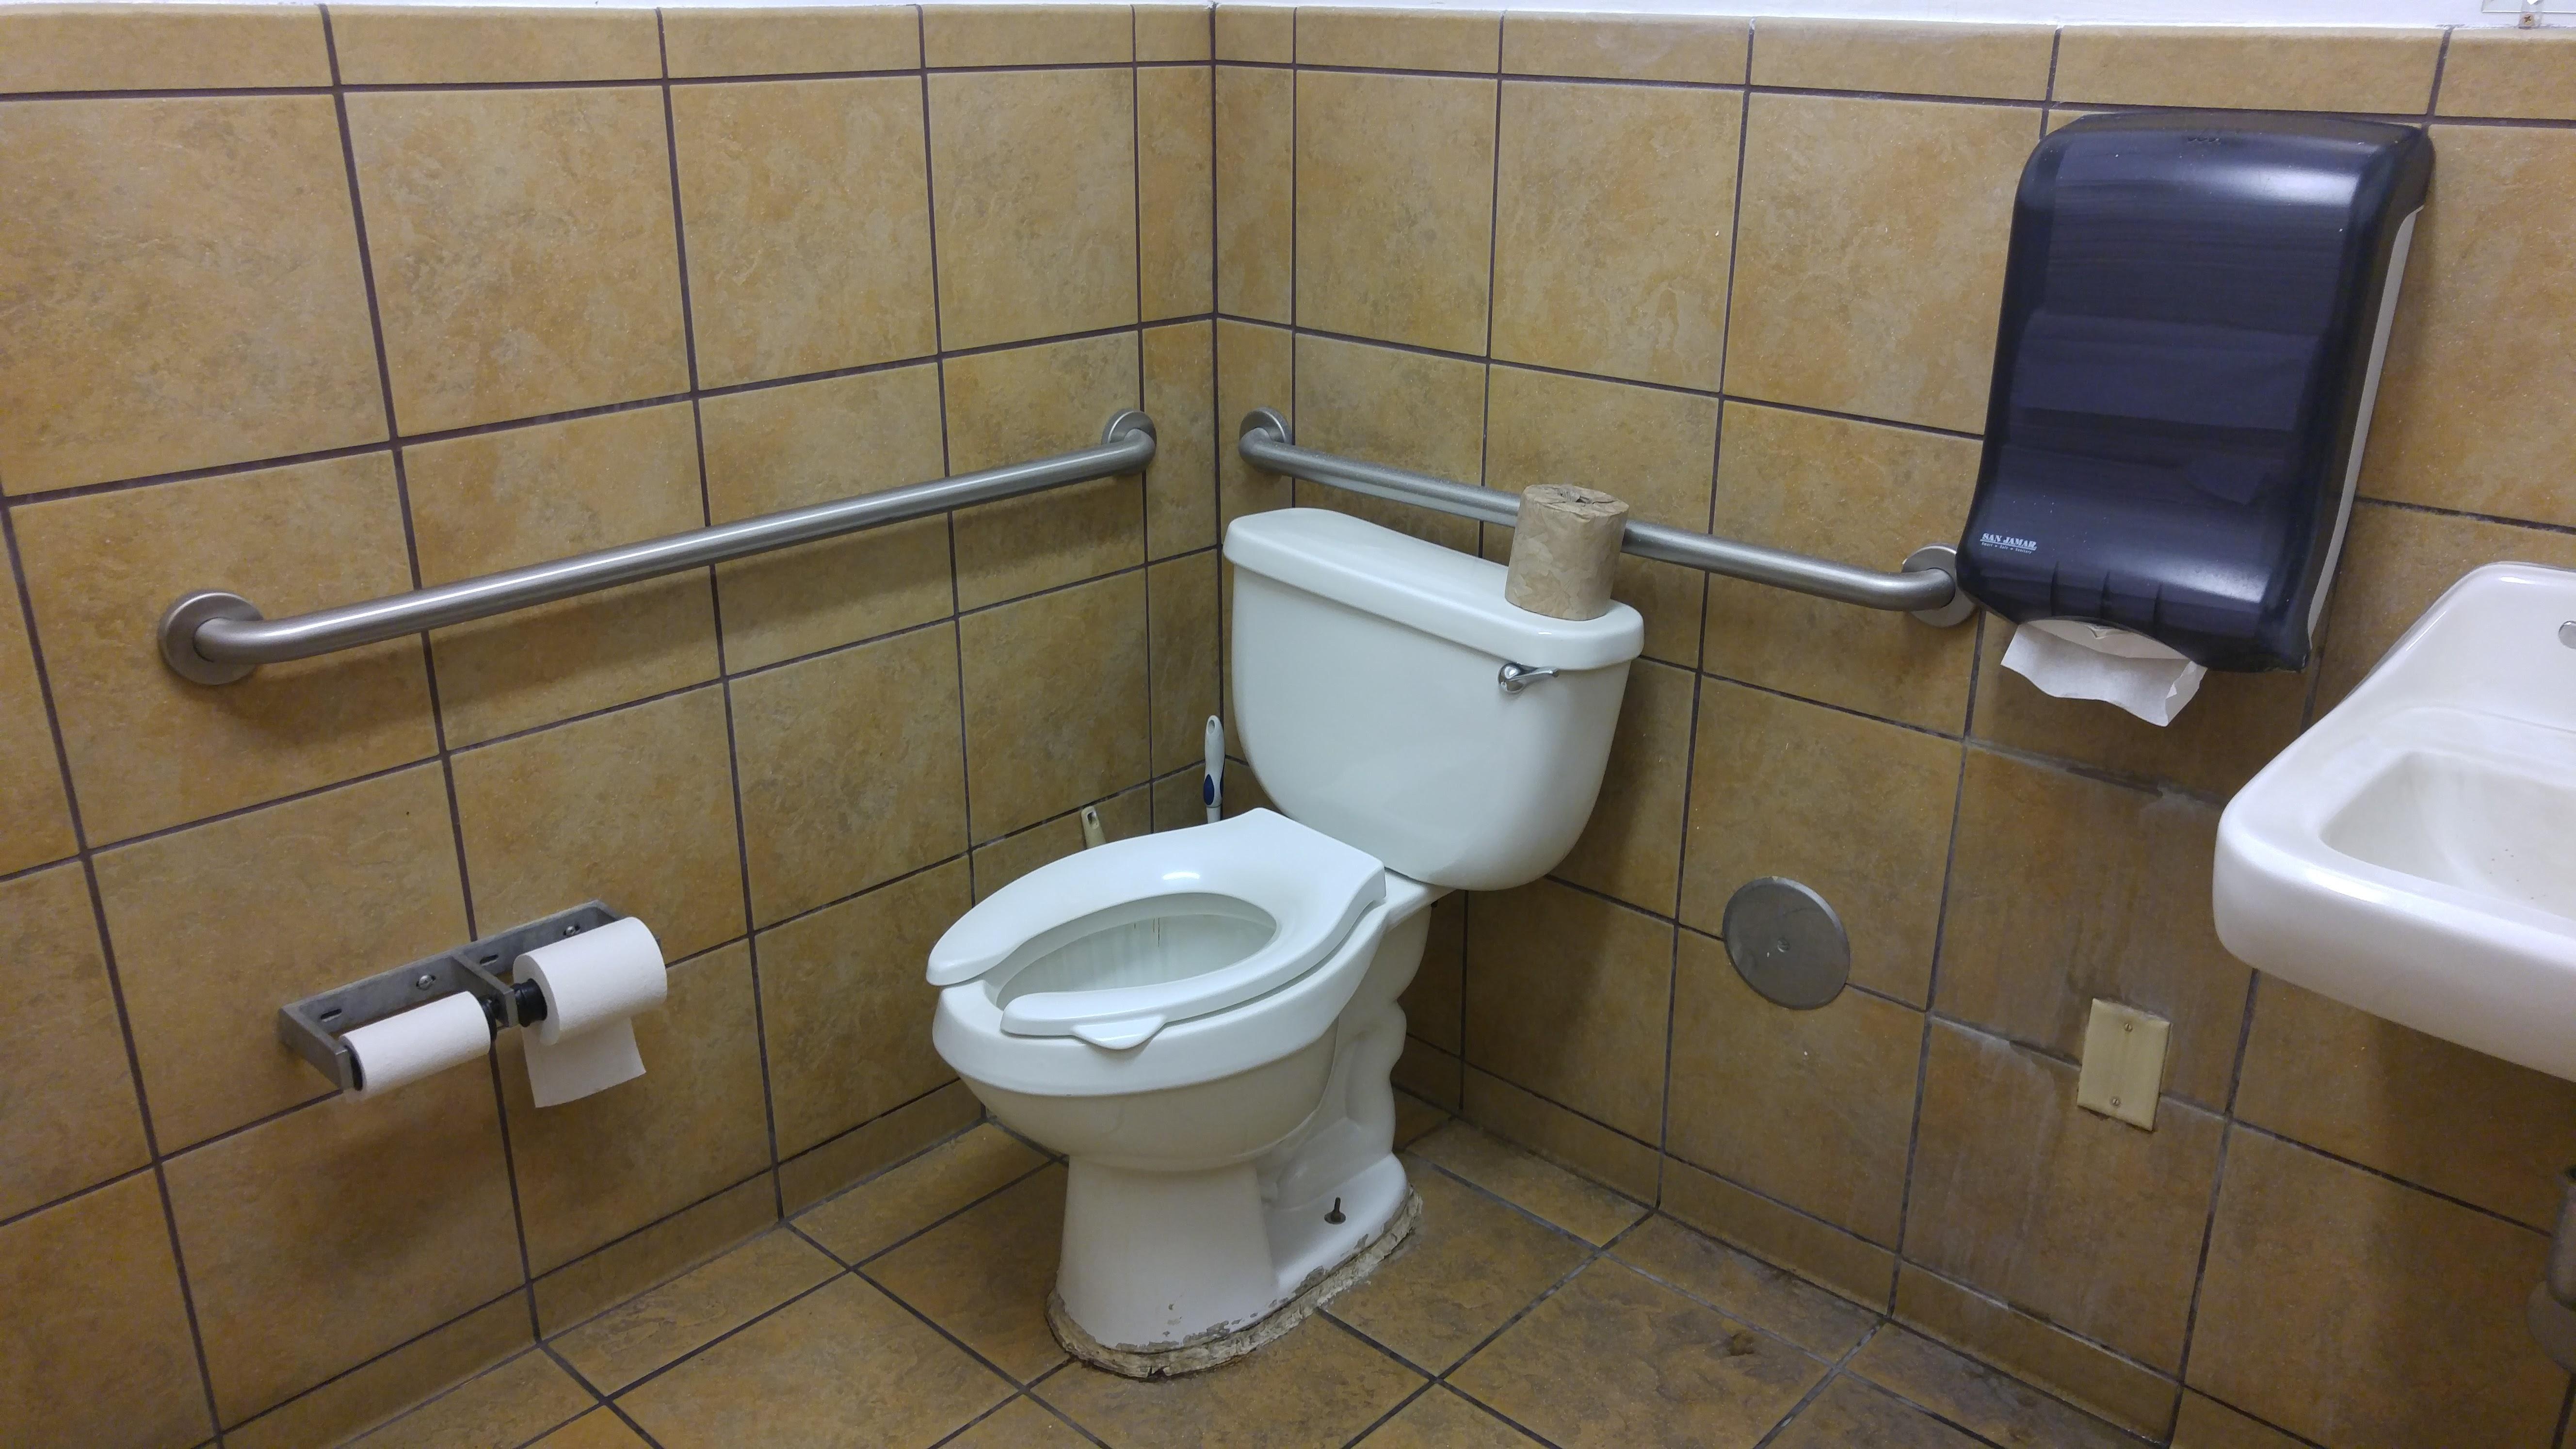 Subway Restaurant At Williams California Bathroom Review